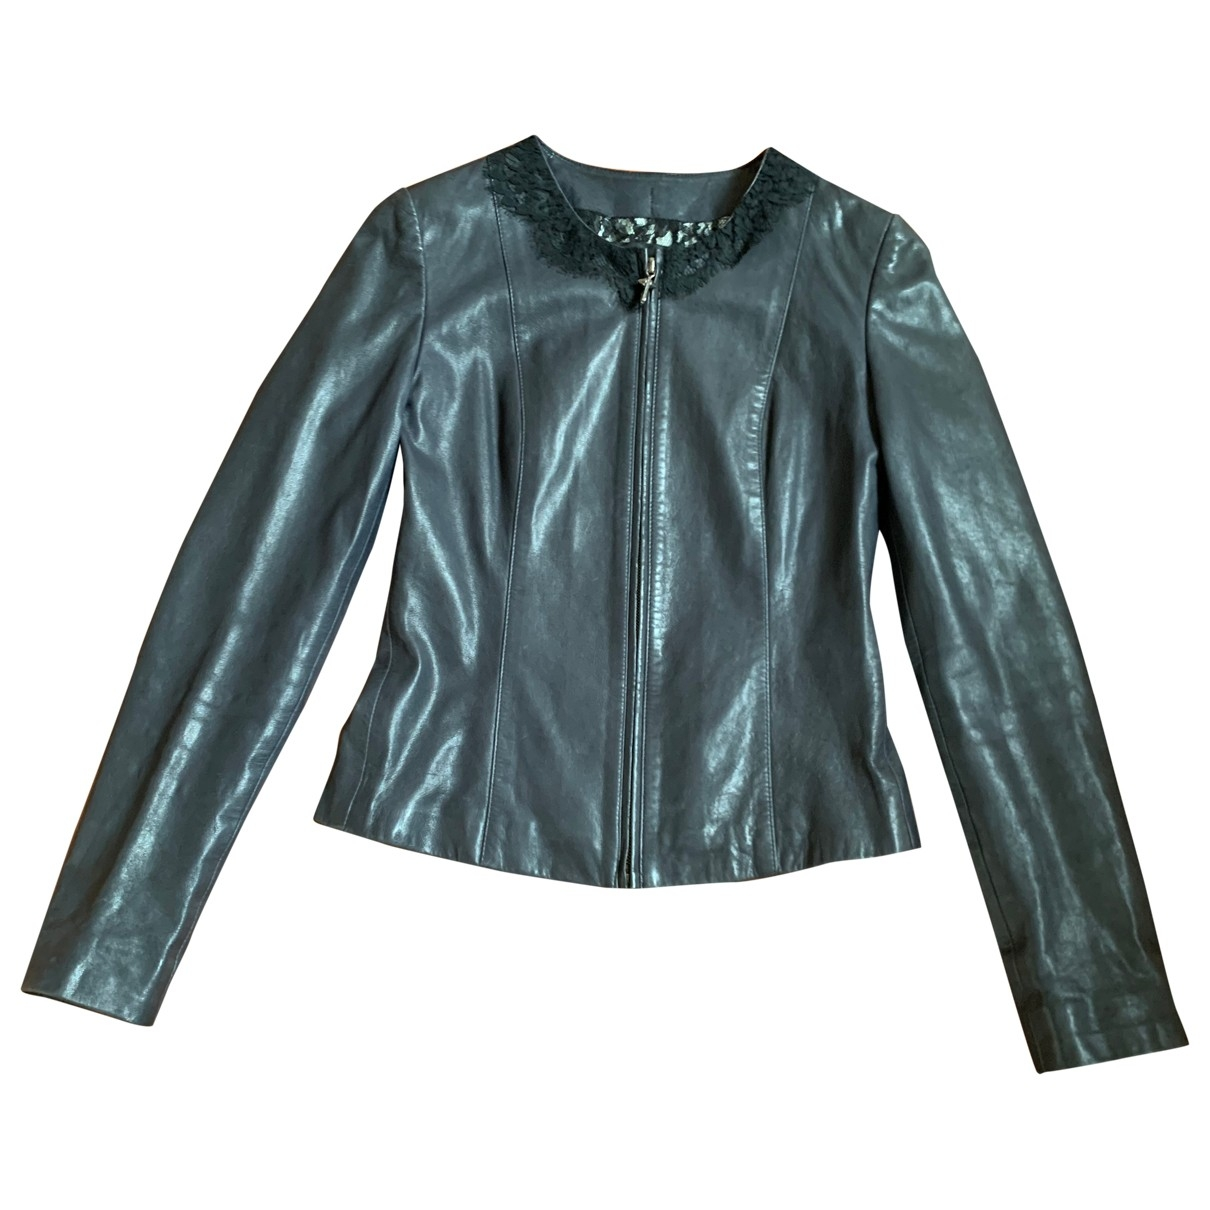 Philipp Plein \N Blue Leather jacket for Women 36 FR